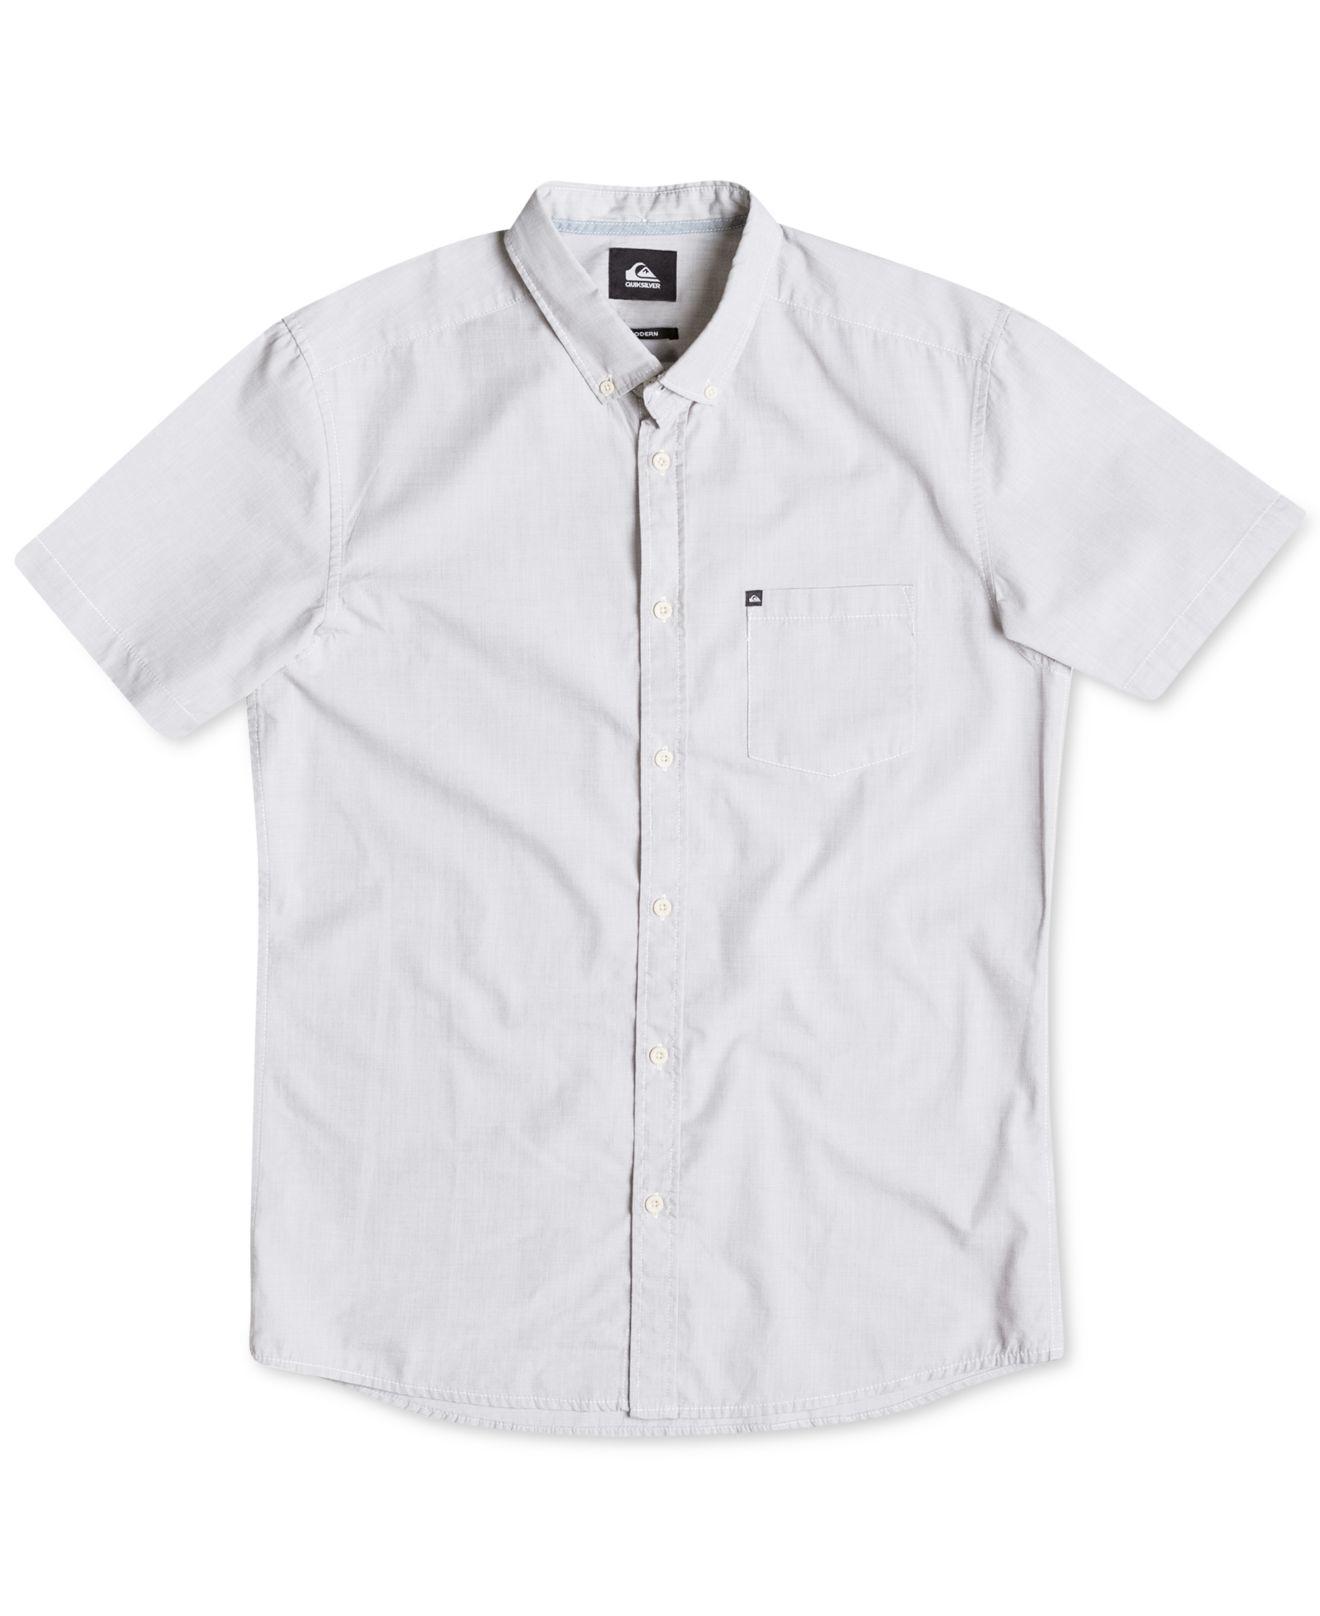 Quiksilver Men 39 S Chambray Button Down Short Sleeve Shirt